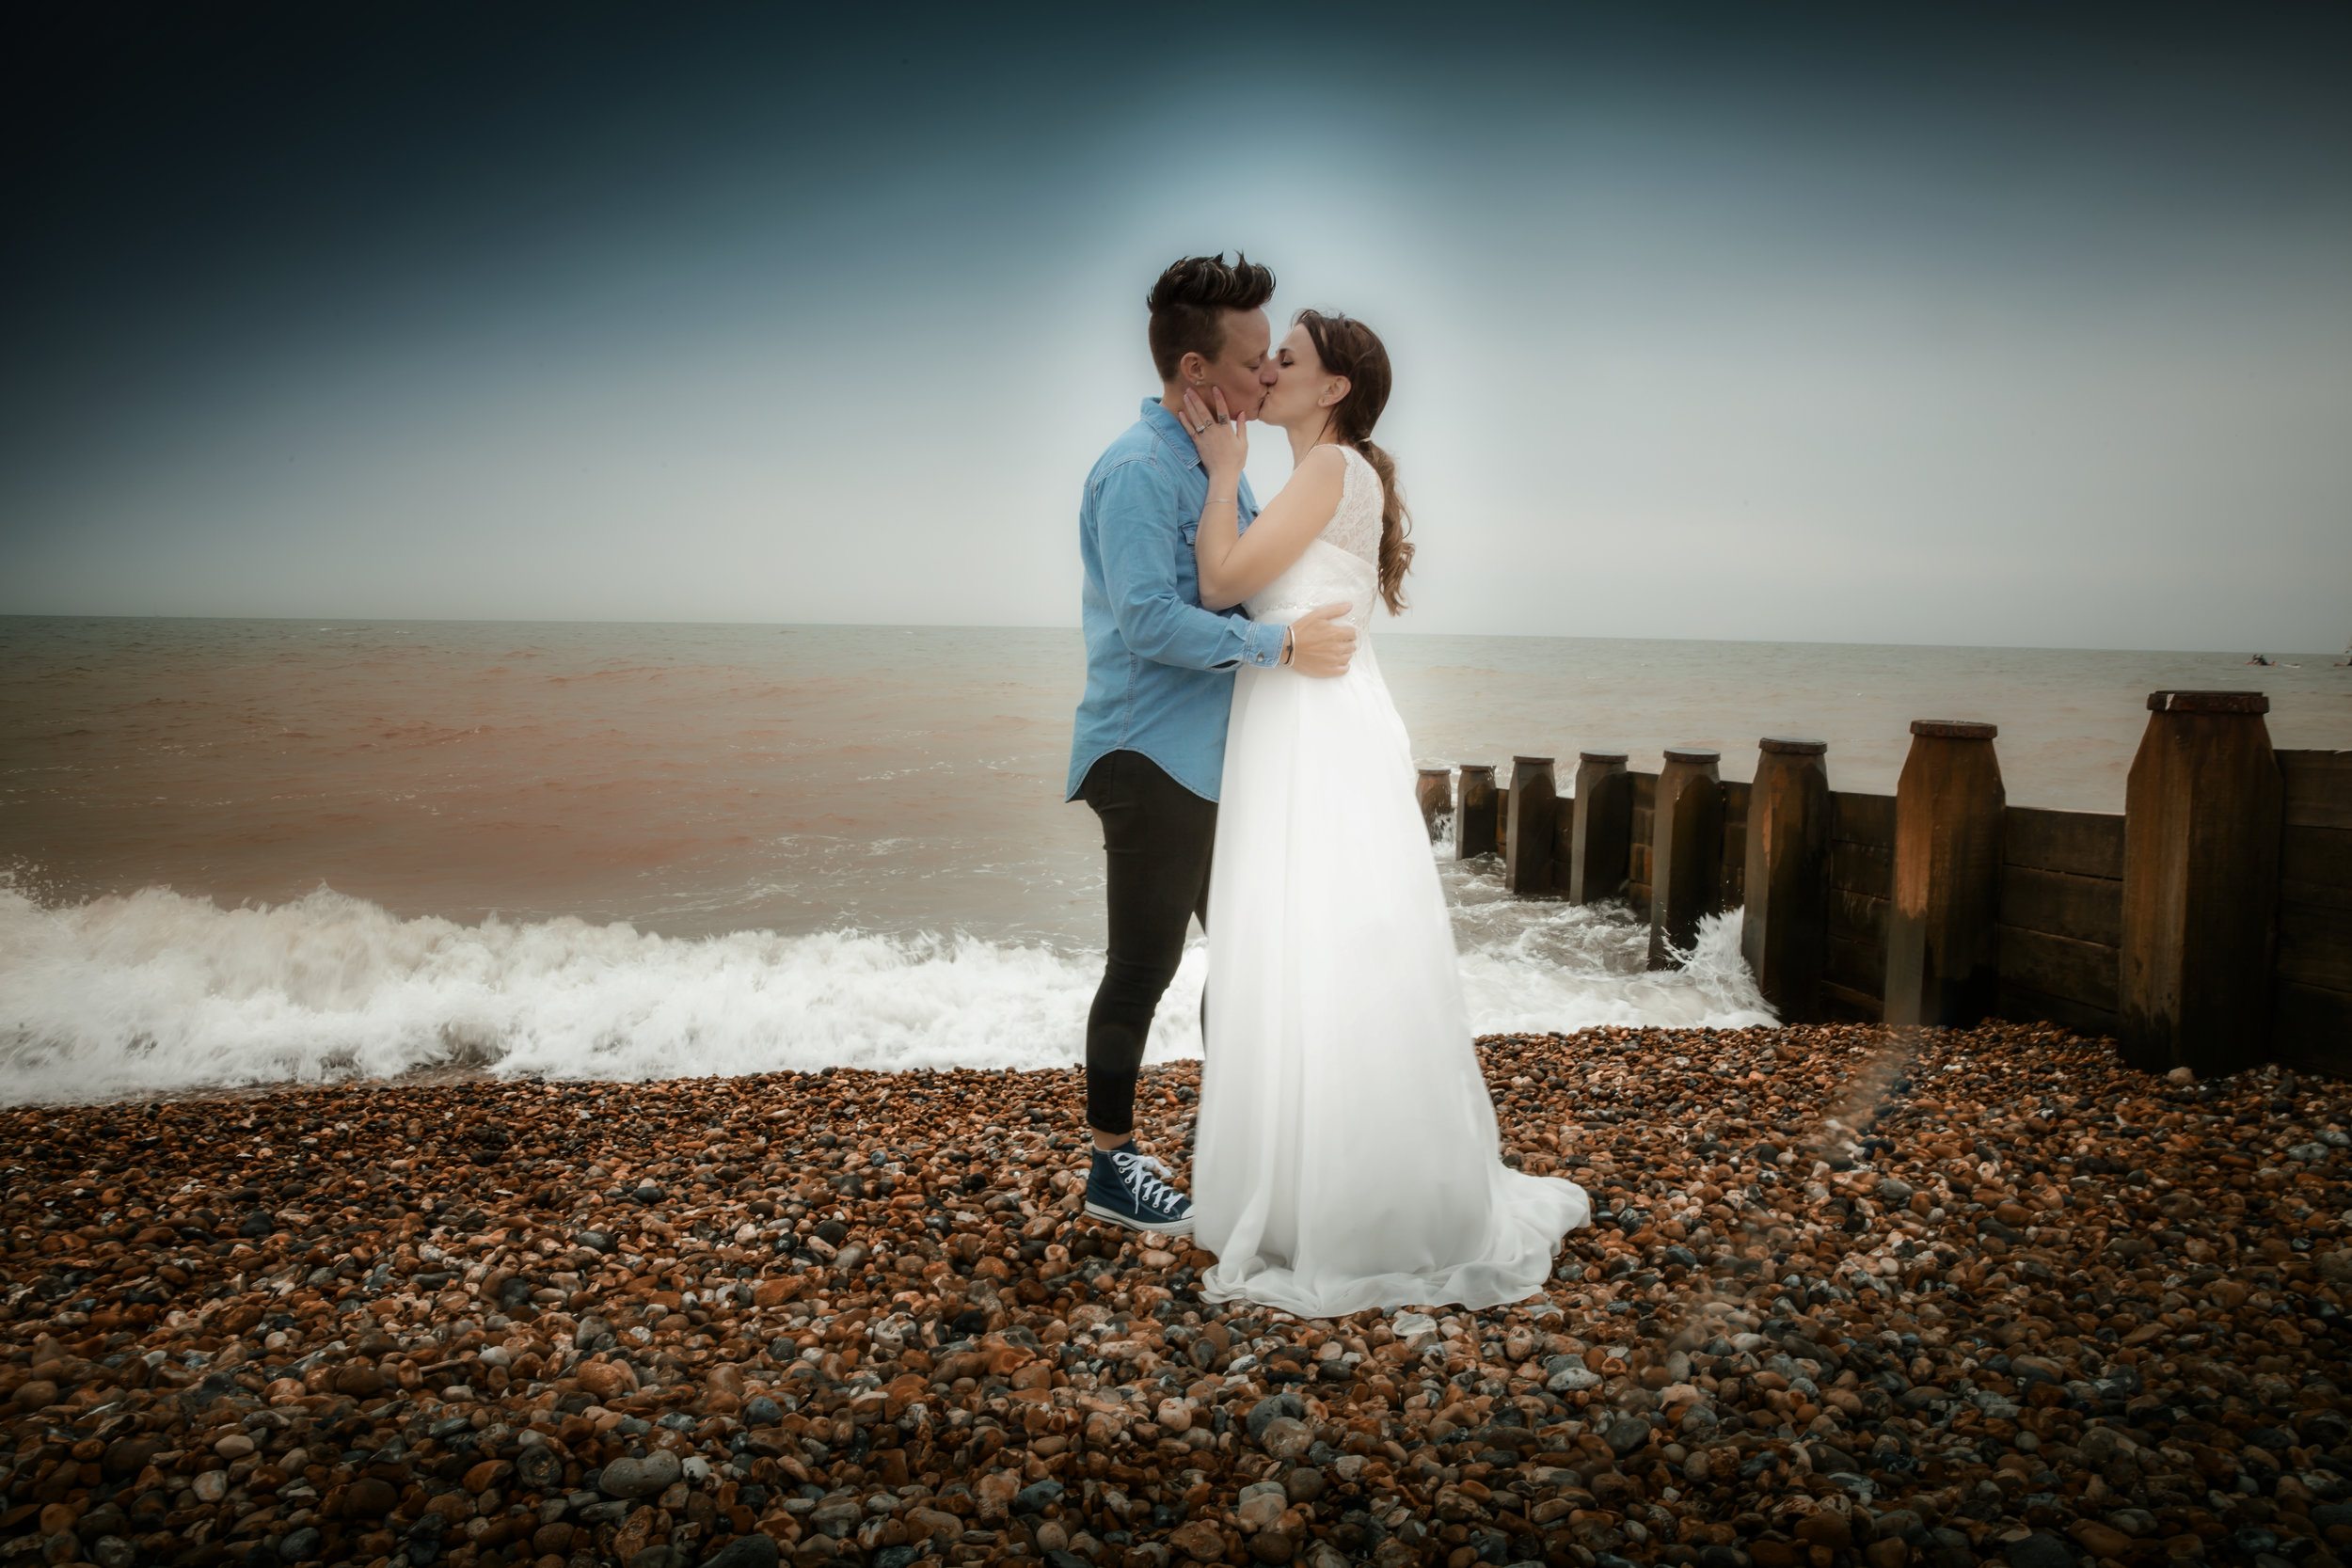 treasure and trash the dress, Wayne Hudson Photography, Lucria Creative, Cornwall and Devon wedding photographer based in Launceston, Beach